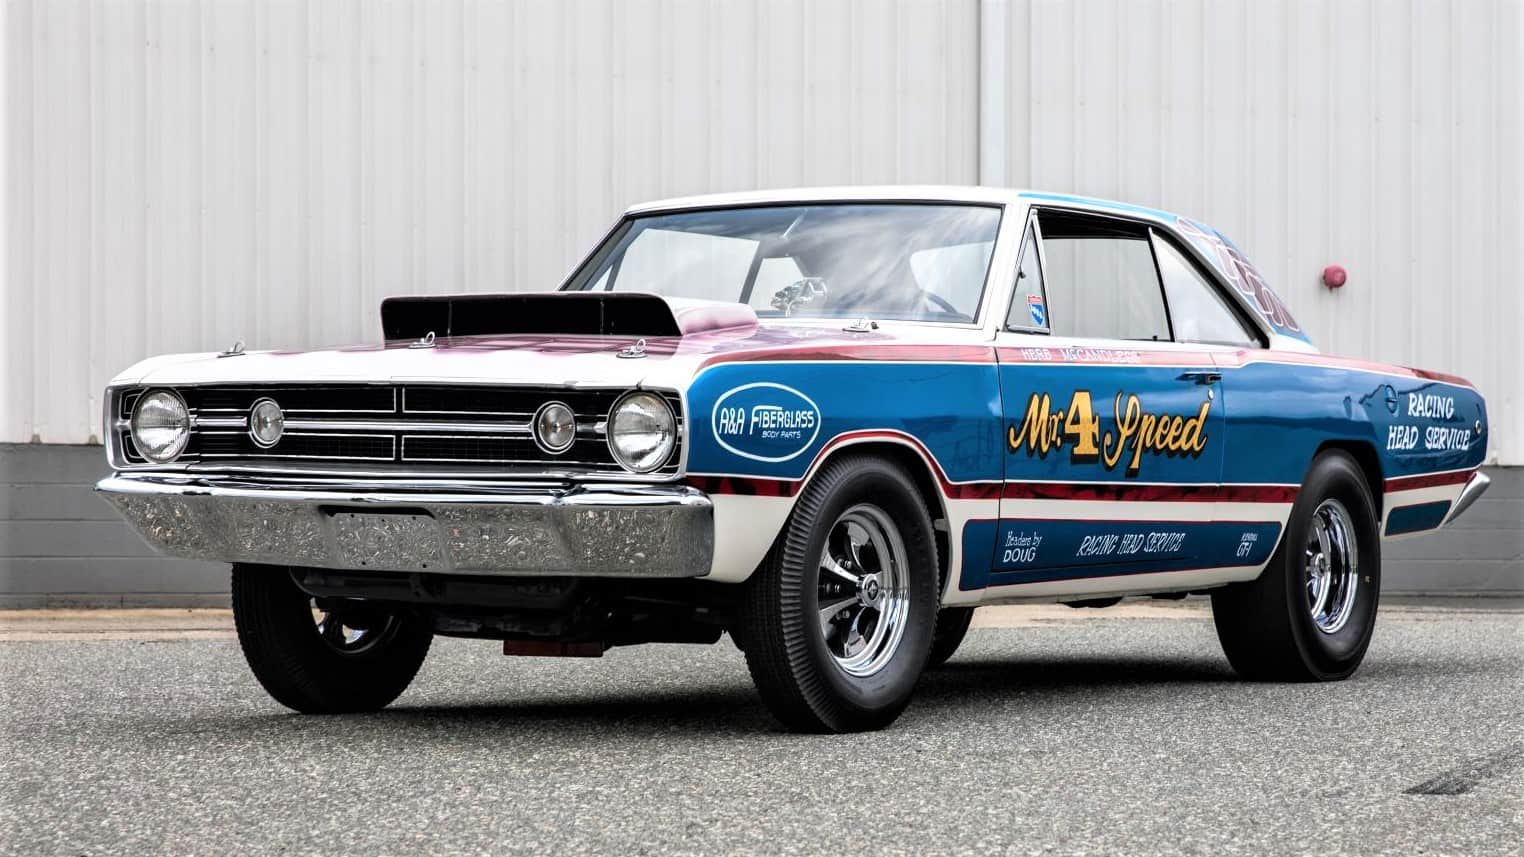 penske, Roger Penske racing winners at Amelia Island, and other event news, ClassicCars.com Journal